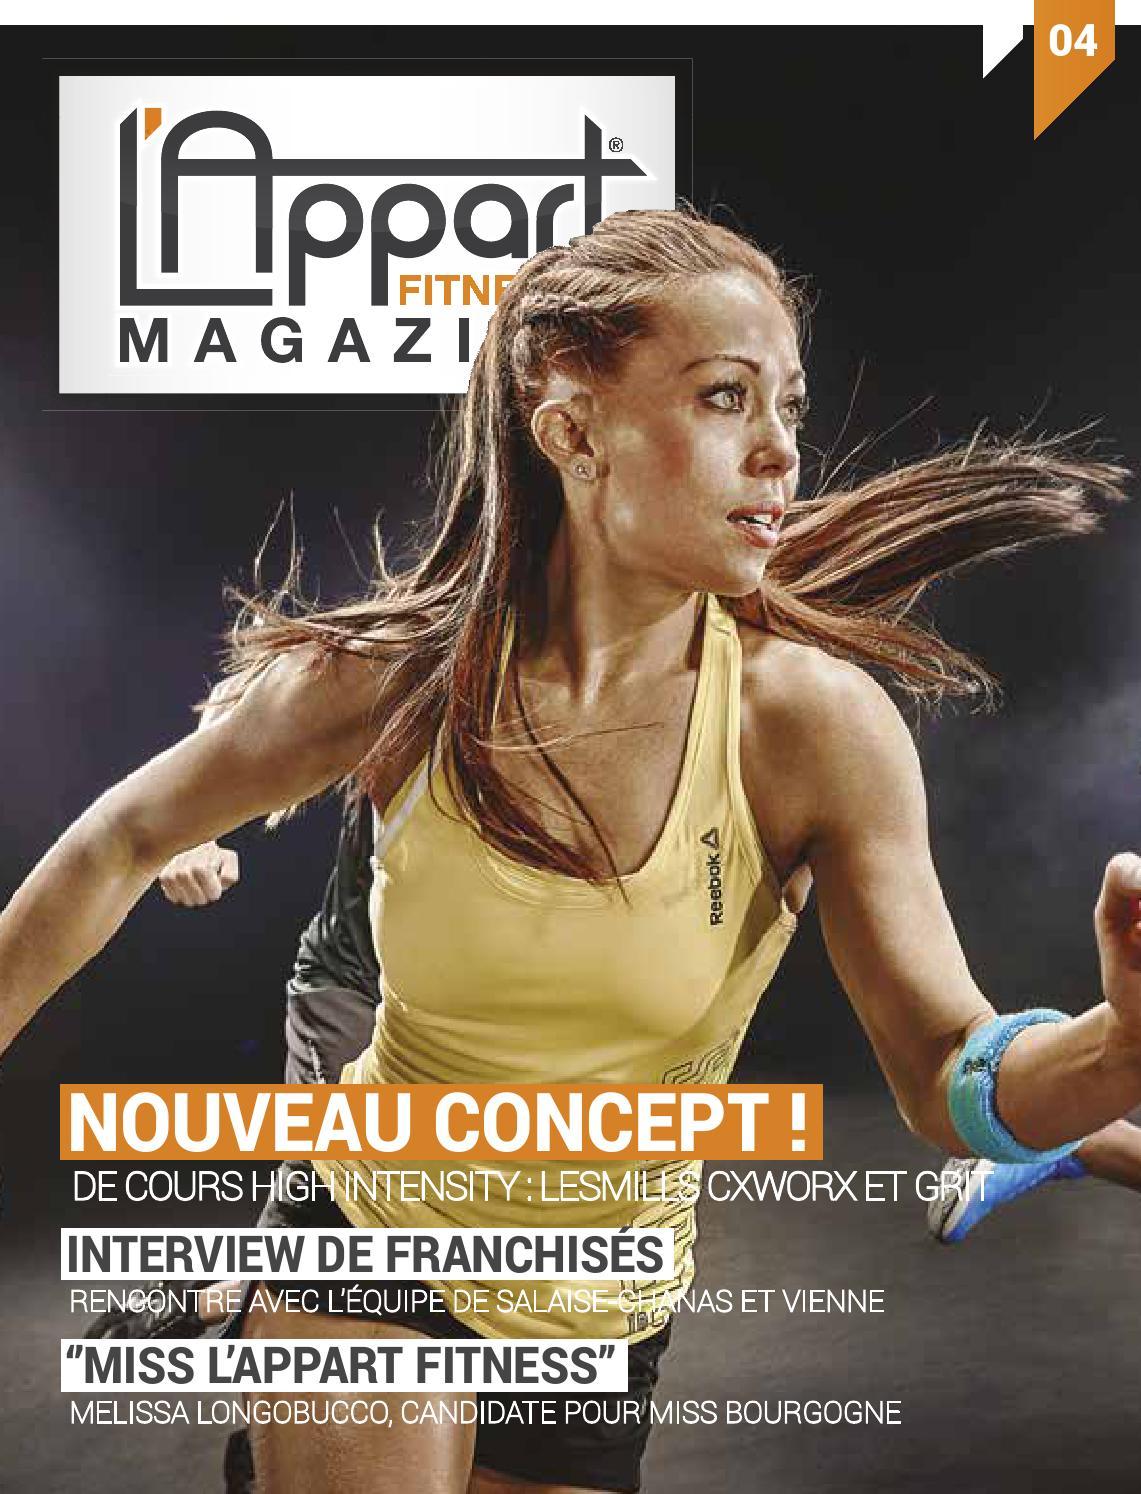 l 39 appart fitness magazine 04 by mog design issuu. Black Bedroom Furniture Sets. Home Design Ideas